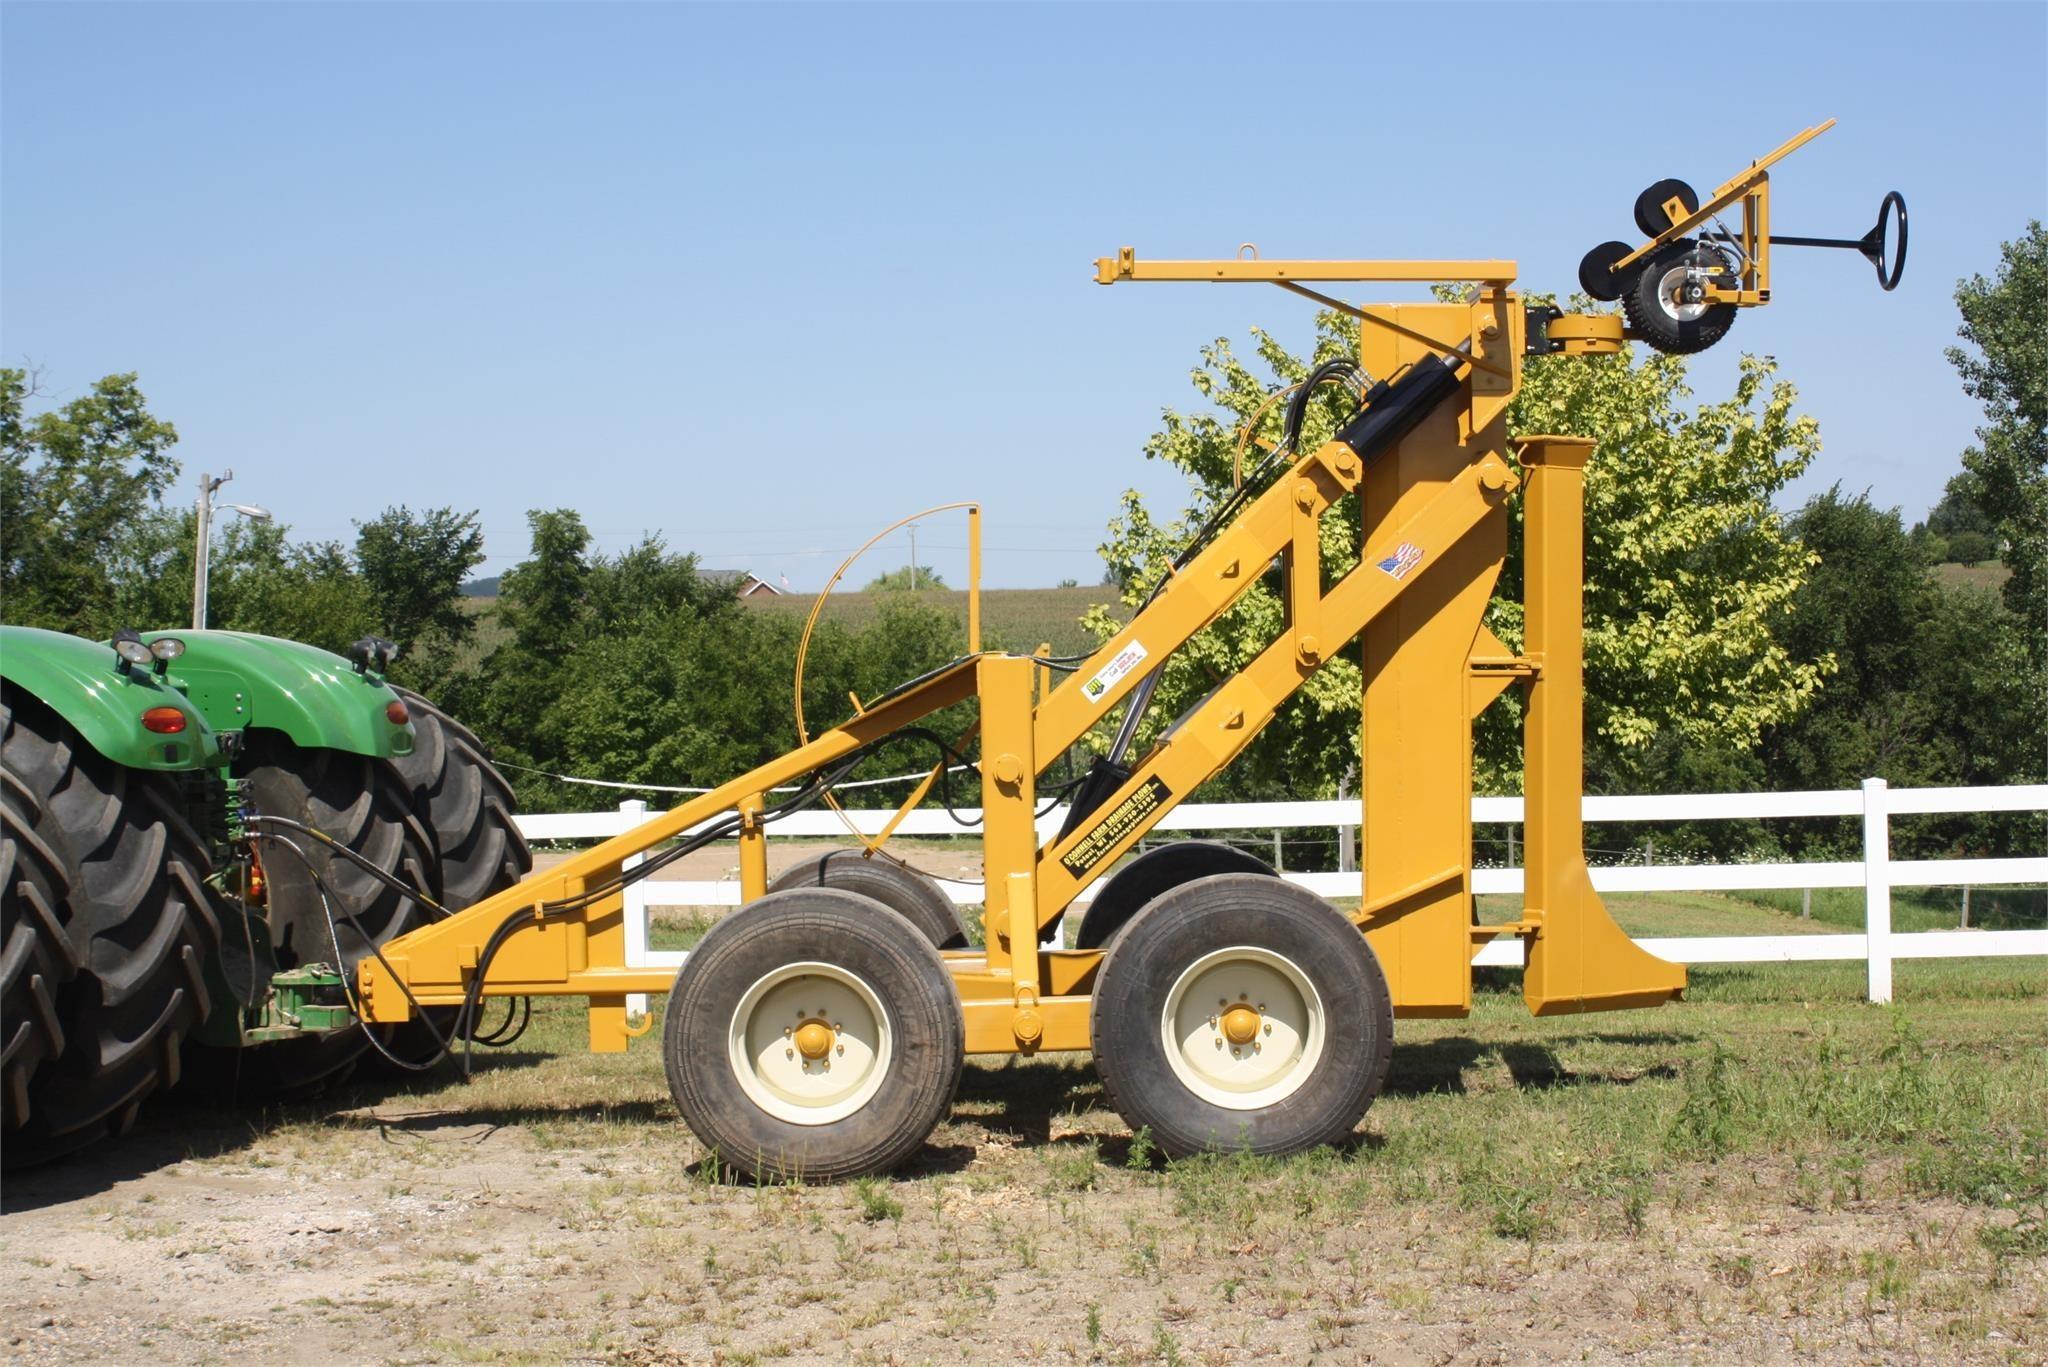 O'CONNELL FARM DRAINAGE PLOWS INC OFDP70 Field Drainage Equipment